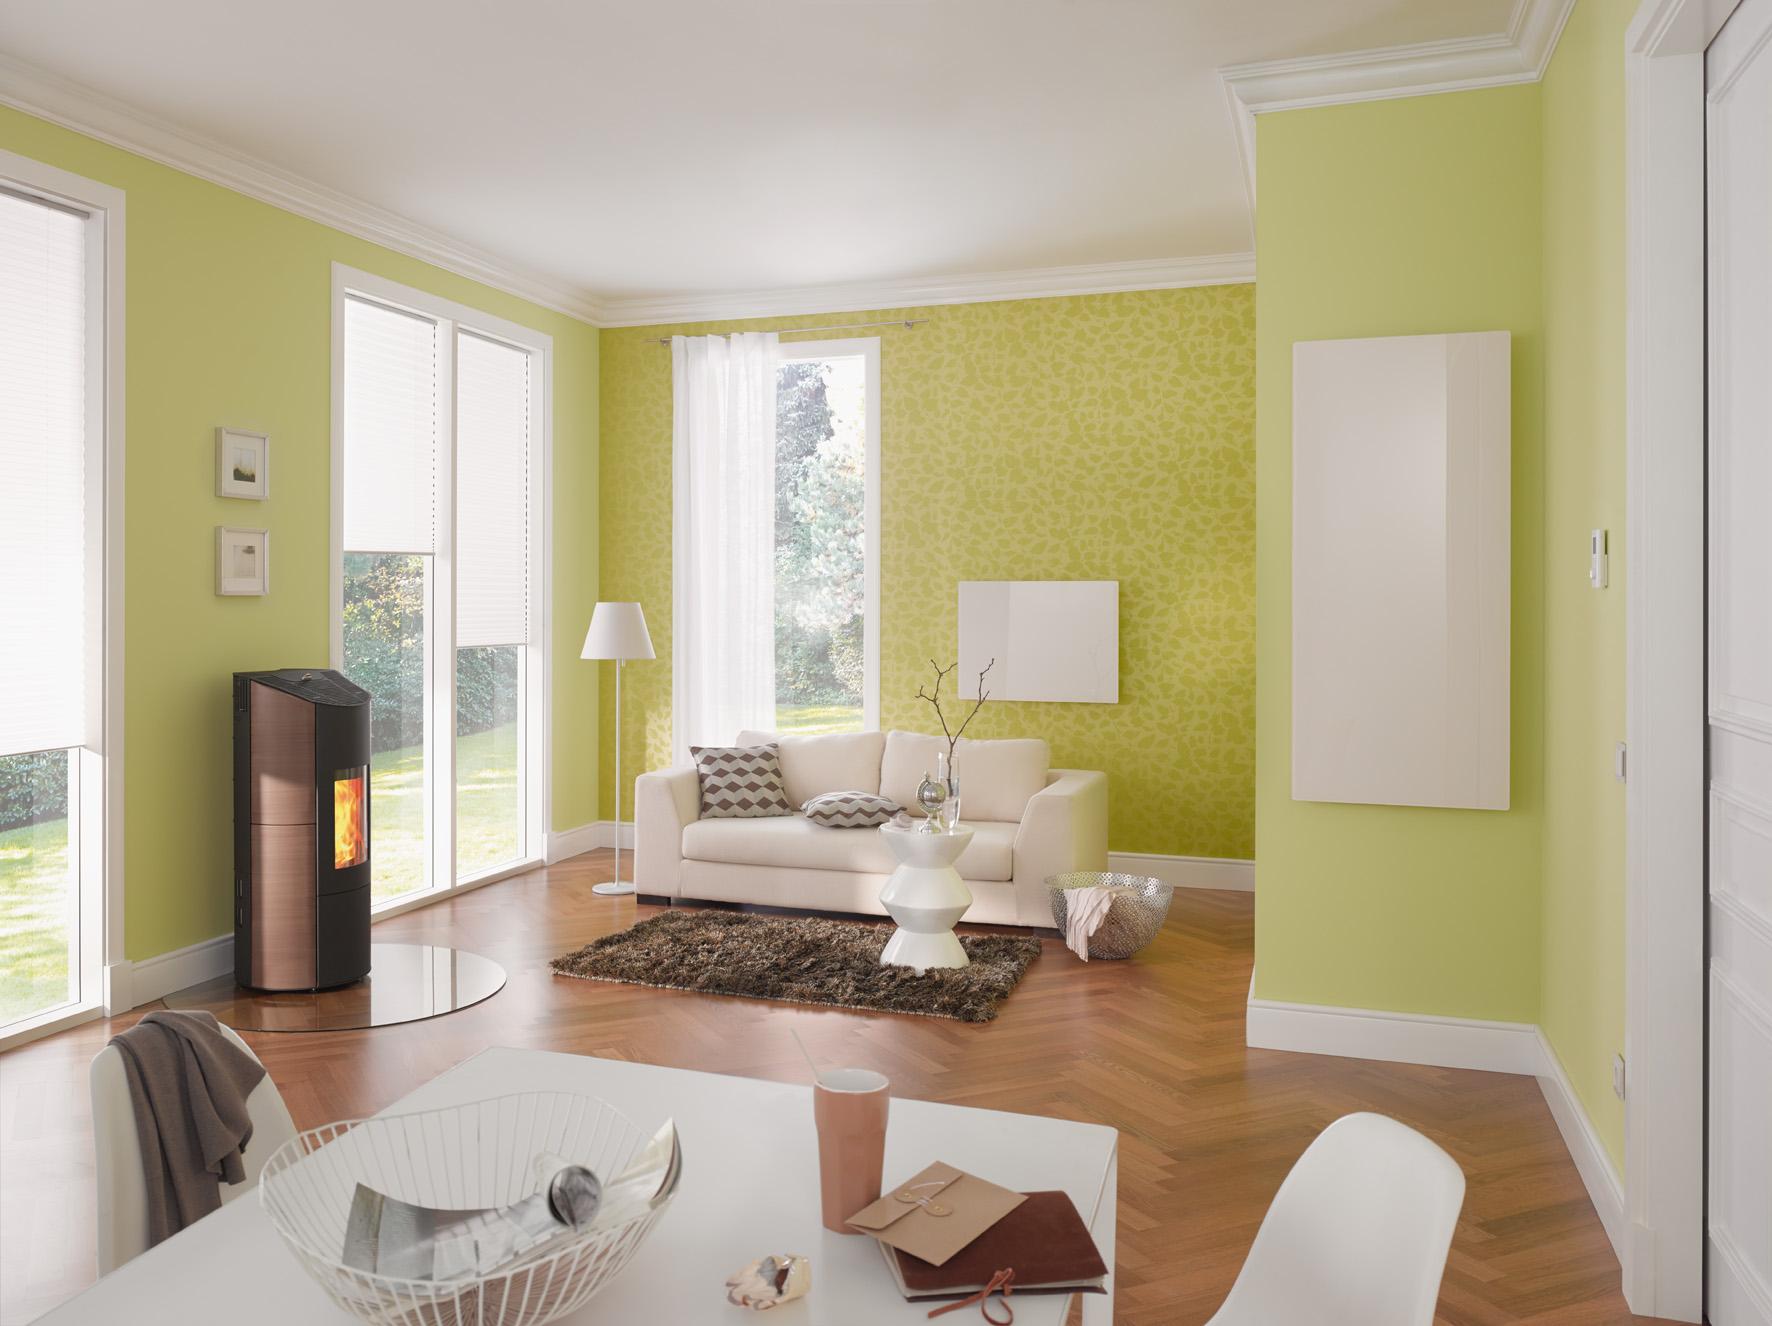 olsberg levana aqua klimaanlage und heizung. Black Bedroom Furniture Sets. Home Design Ideas